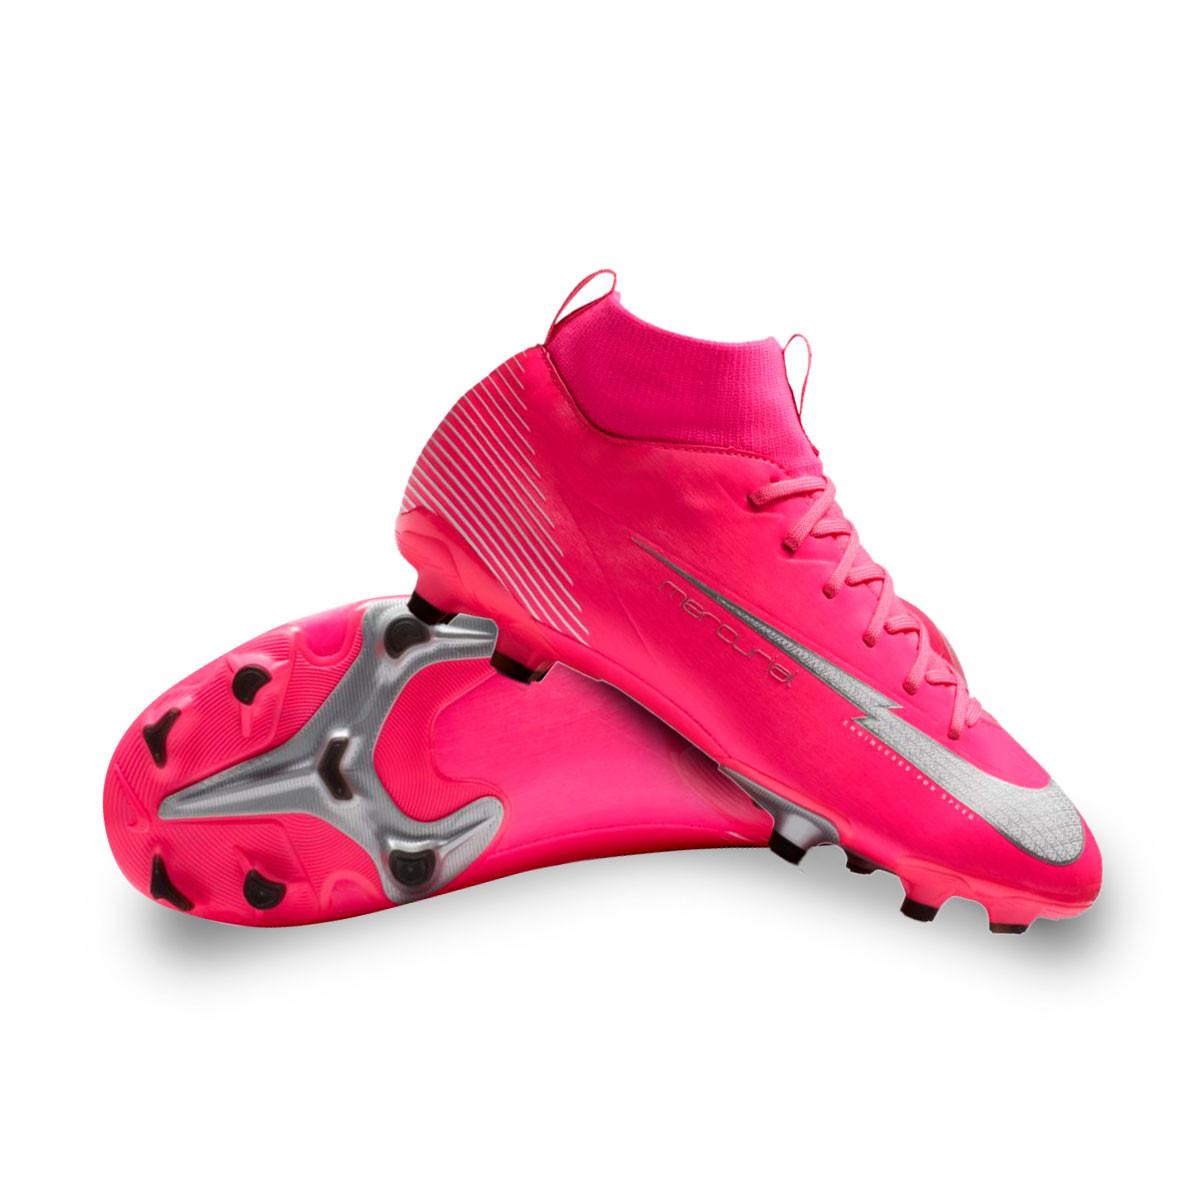 Football Boots Nike Superfly 7 Academy